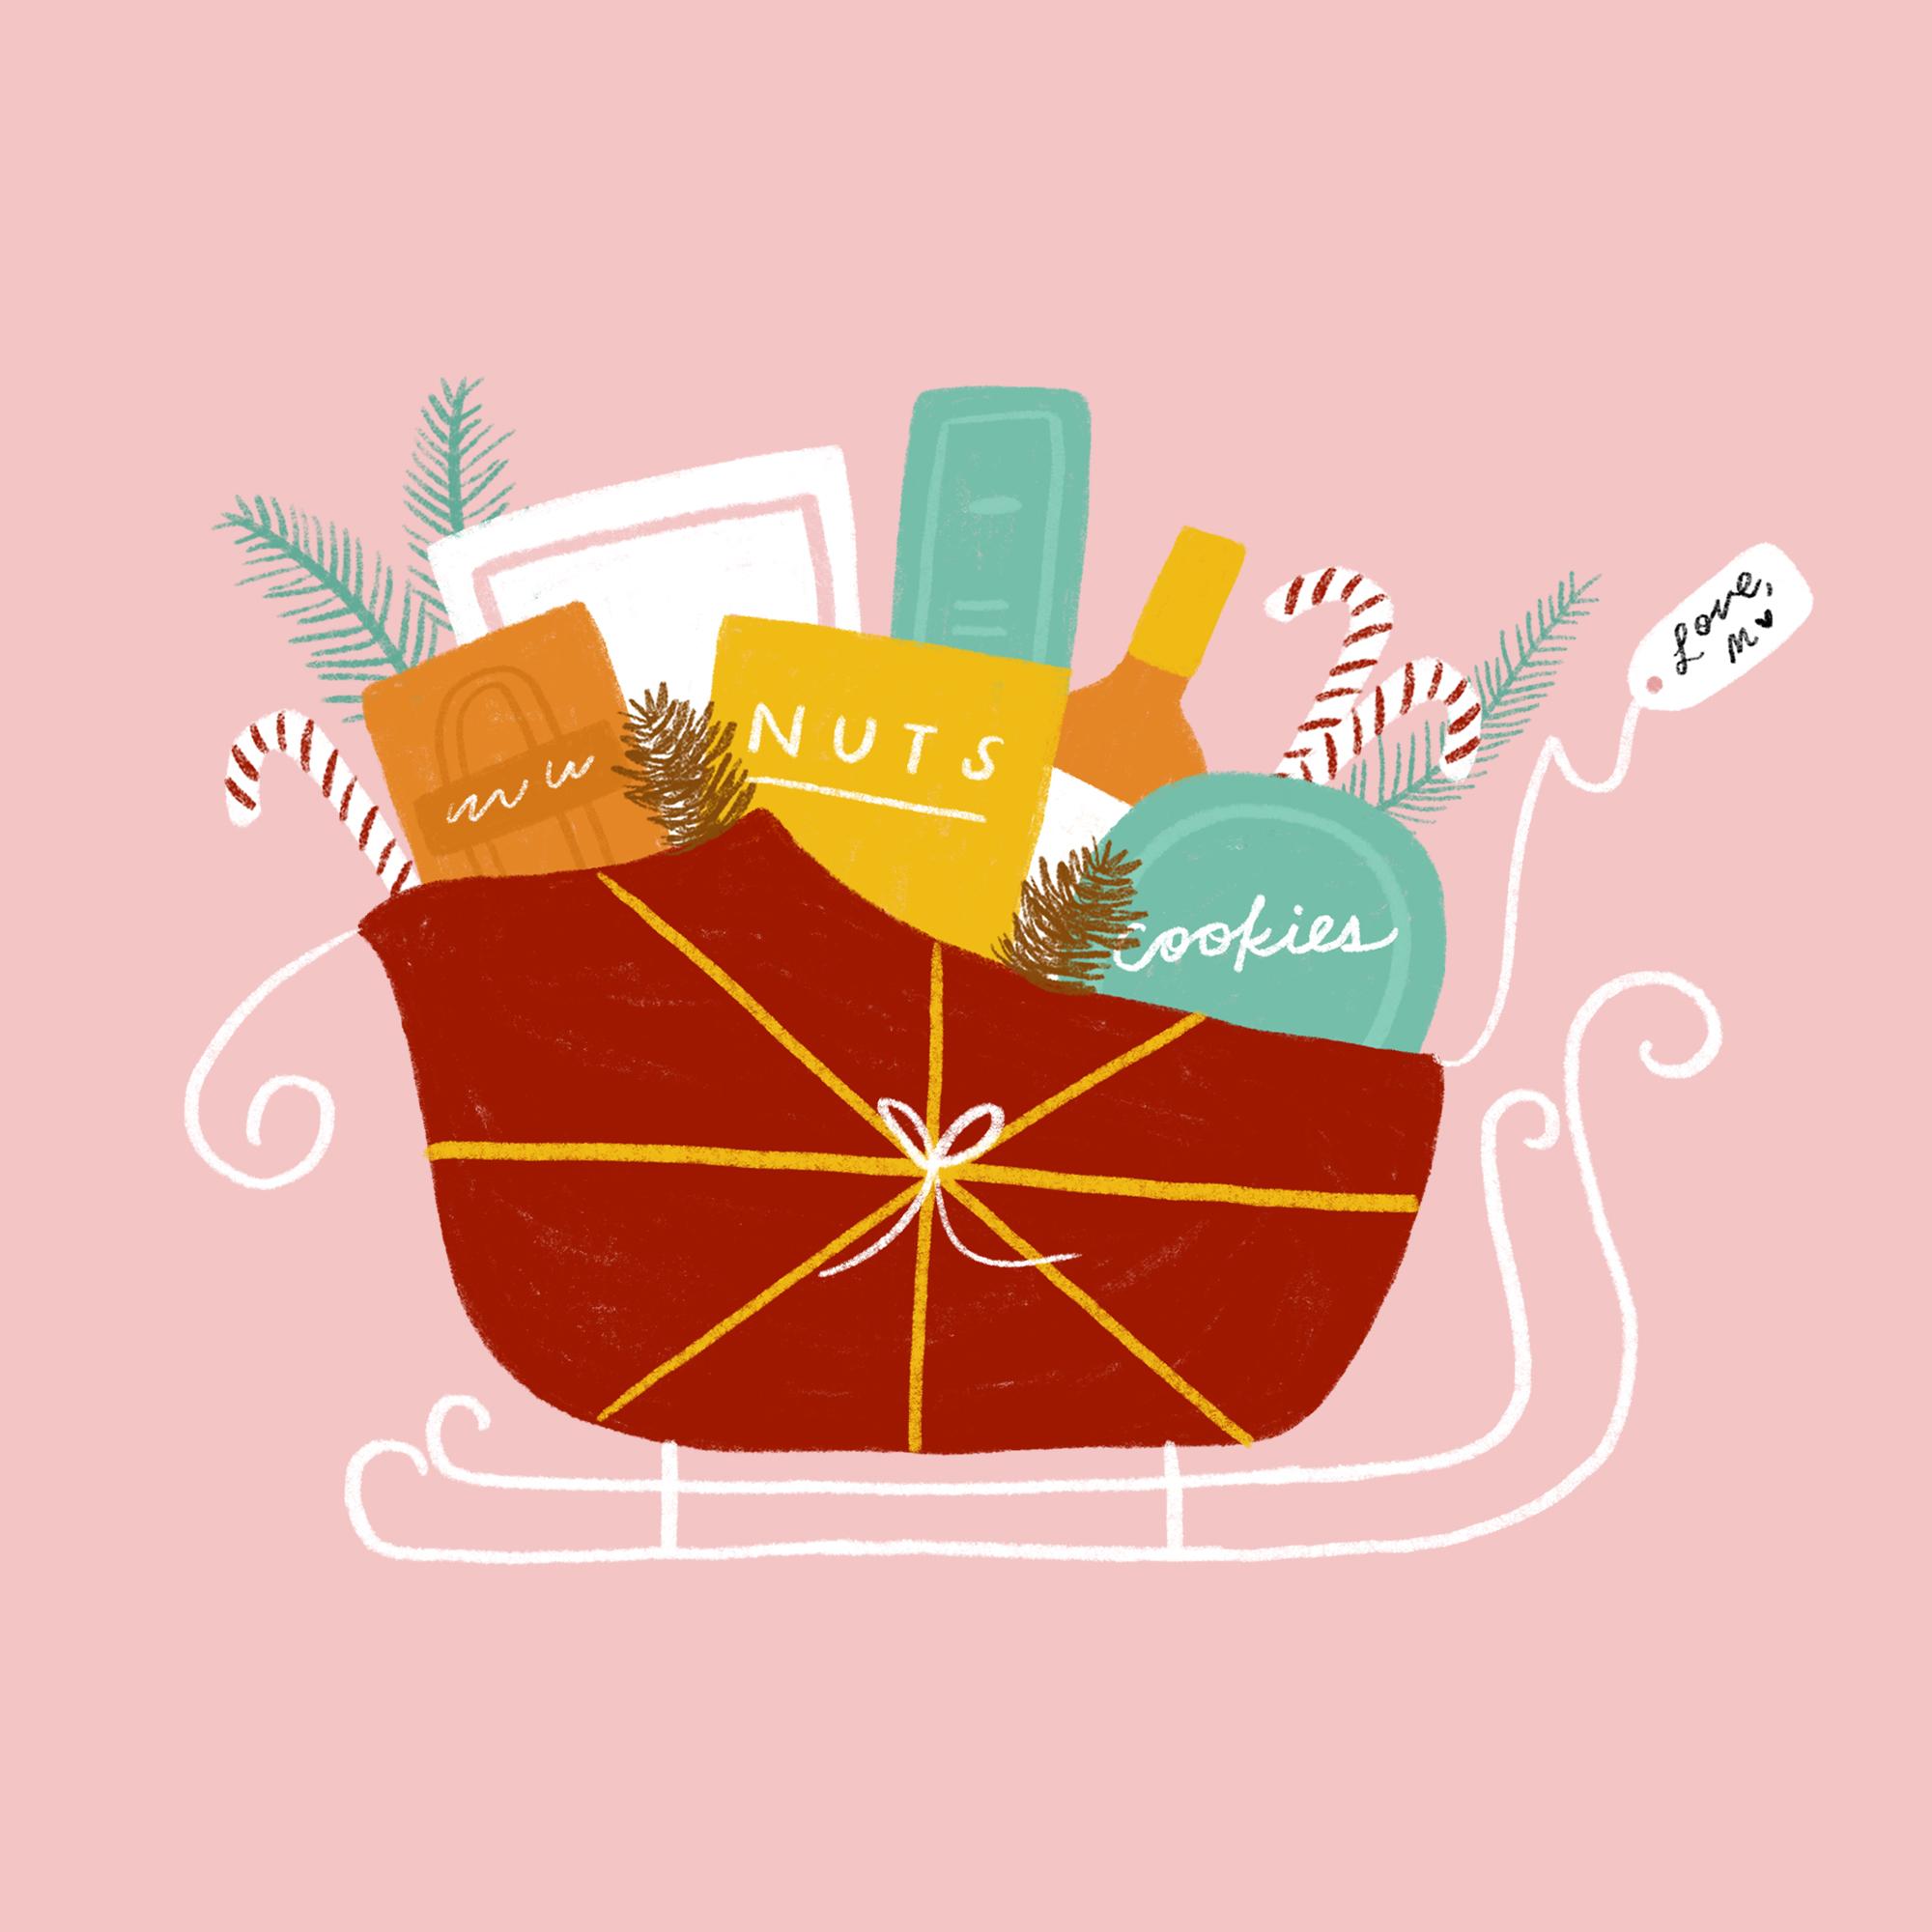 Kohls_Holiday-Guide_Chapter-Headers_6.jpg